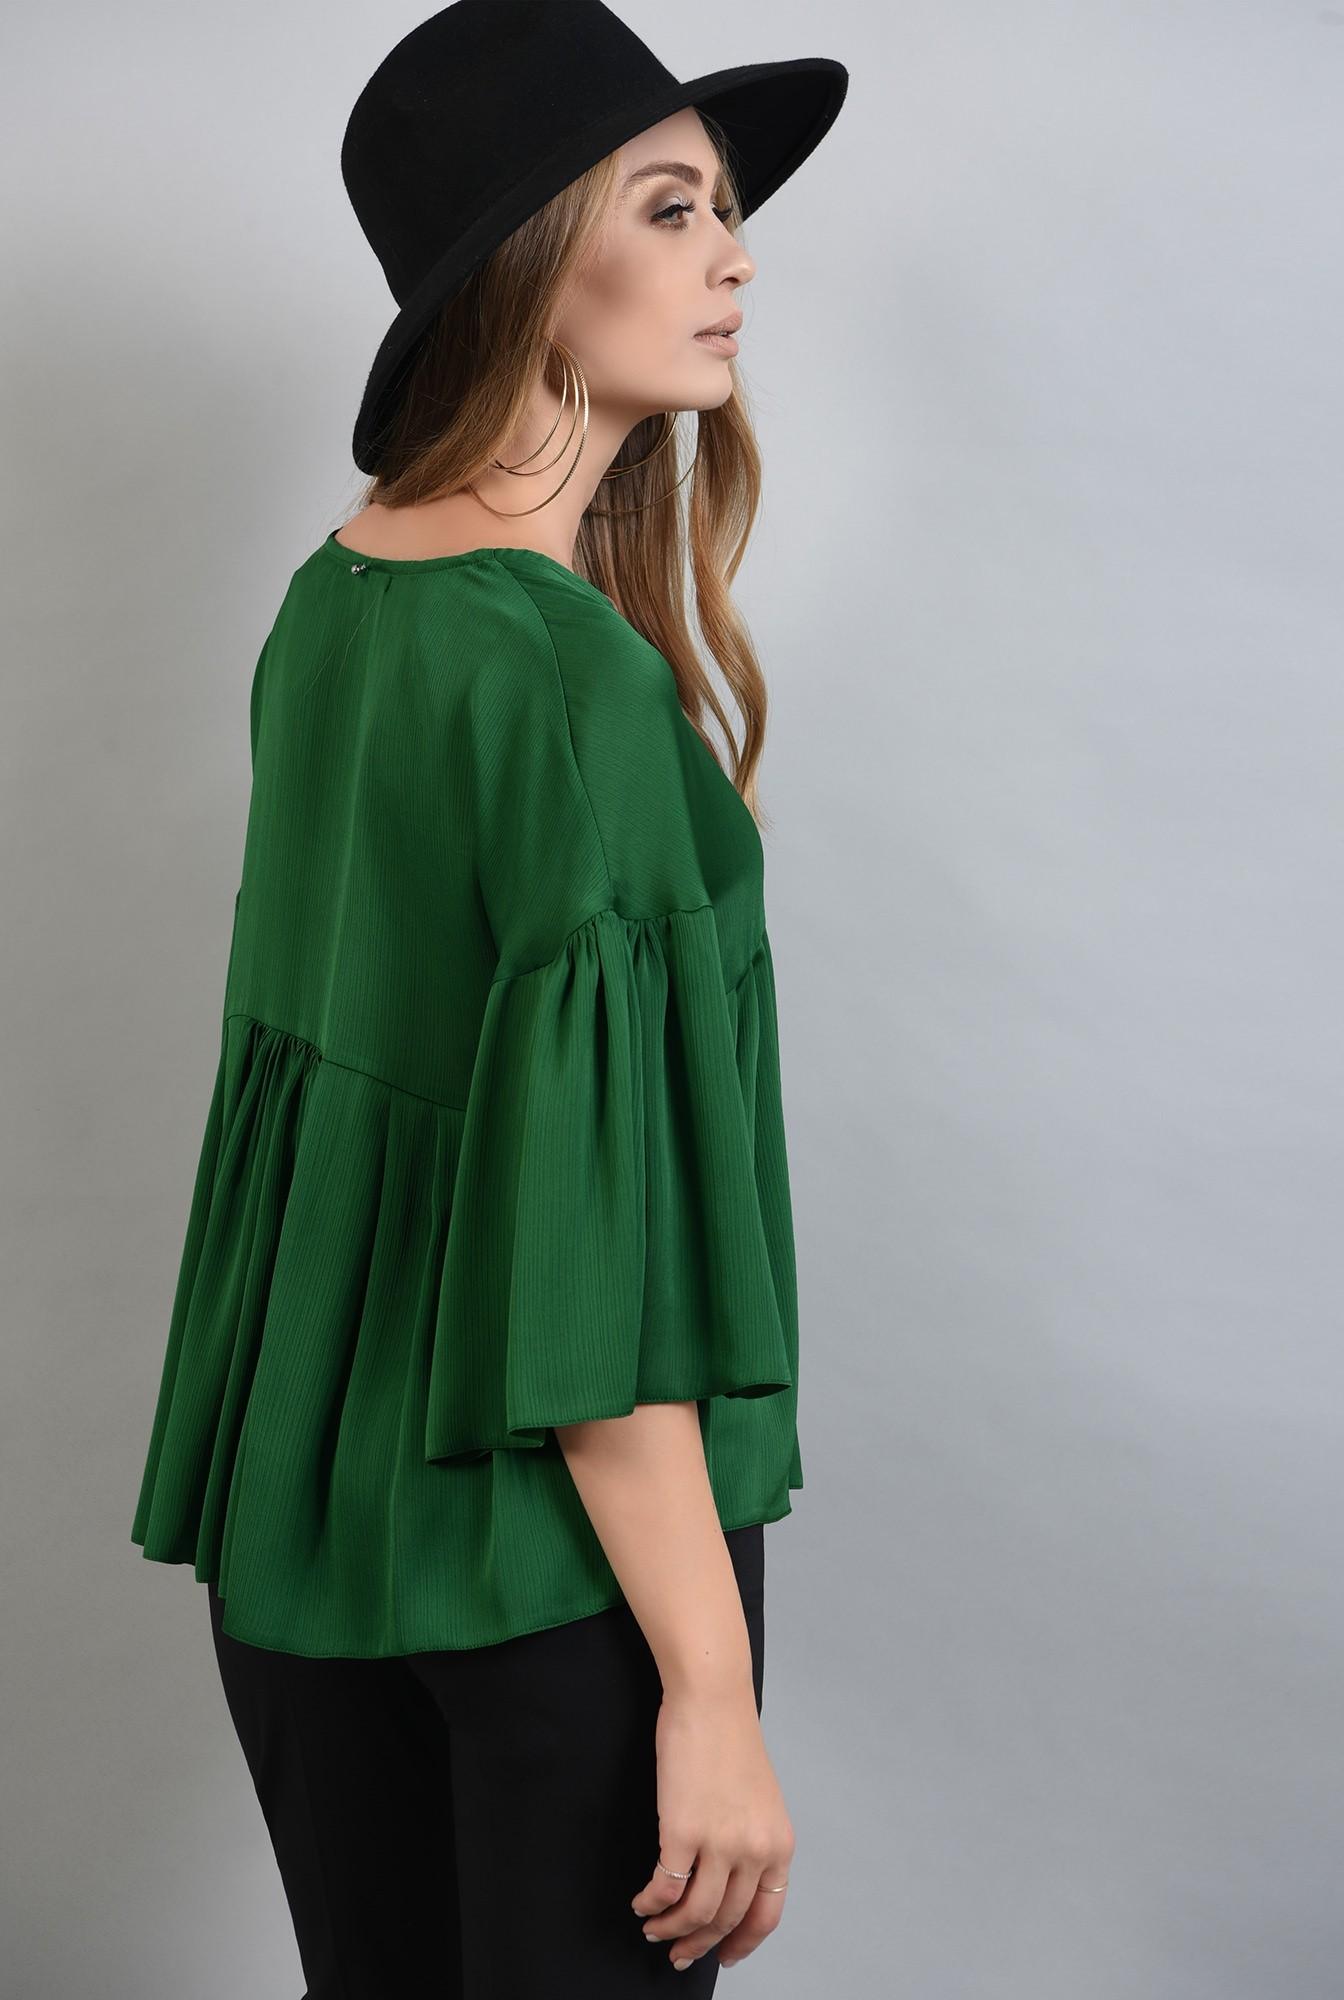 1 - bluza larga, verde, cu peplum